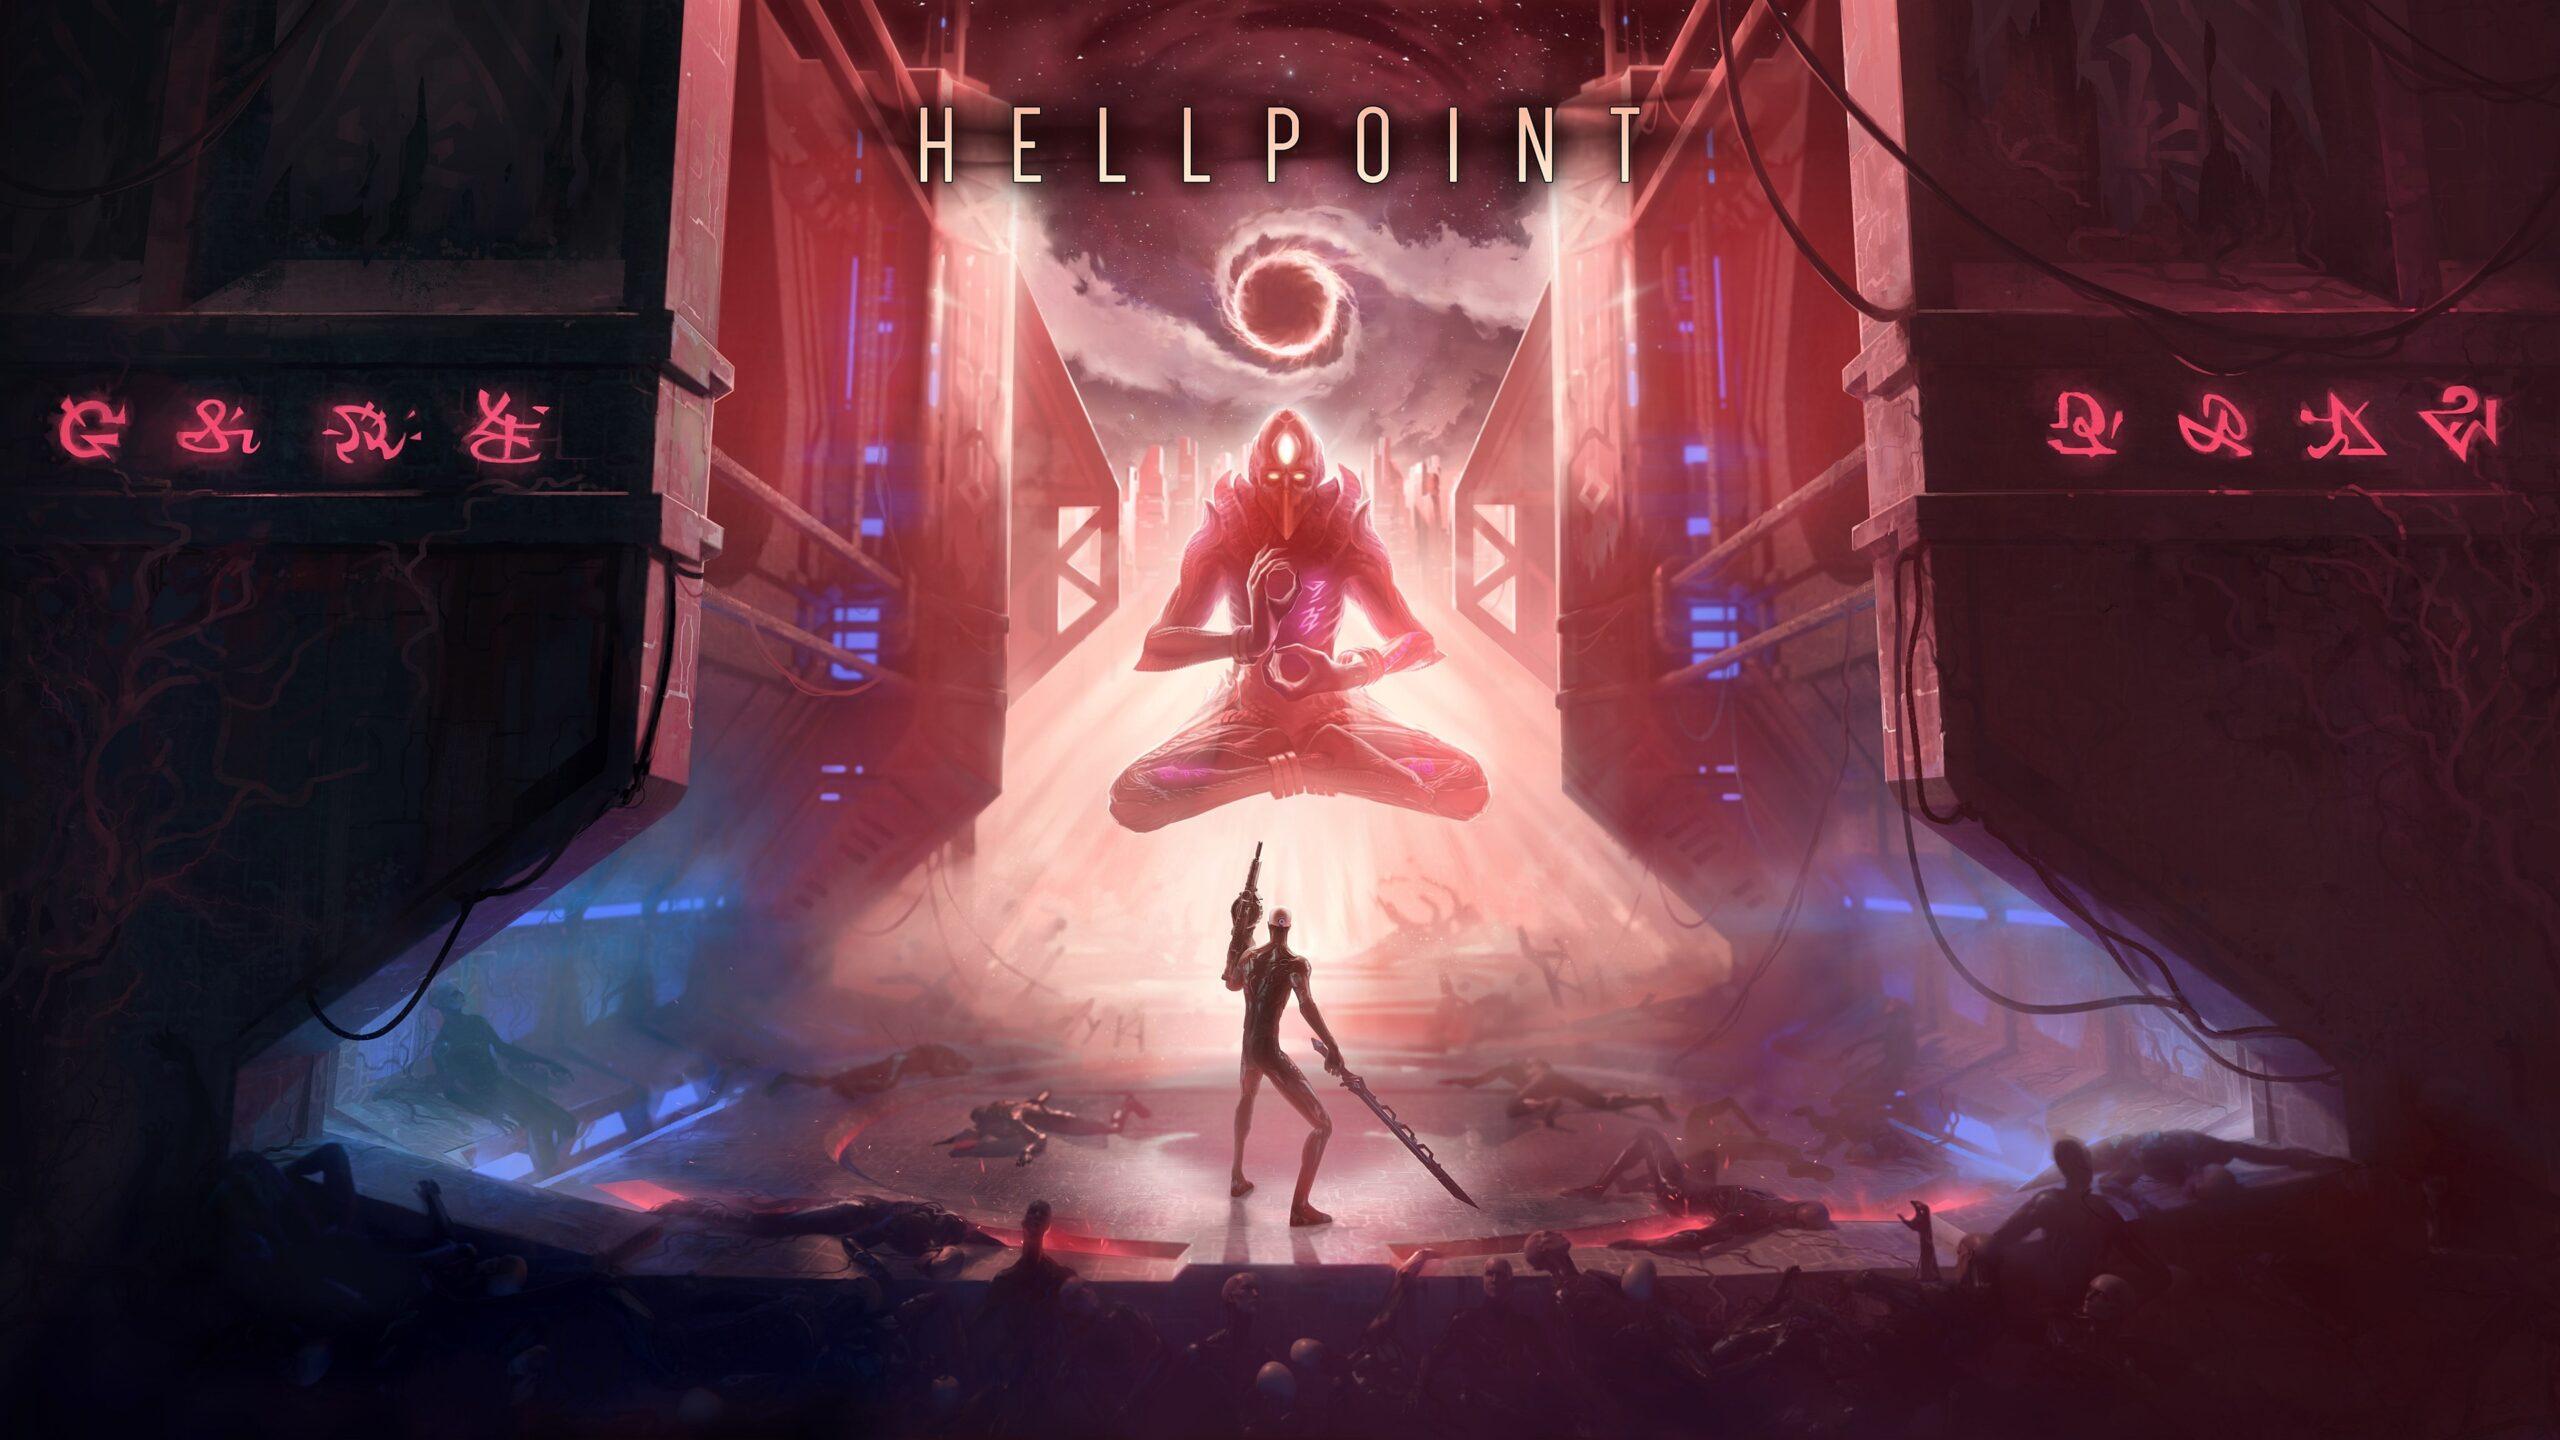 Hellpoint